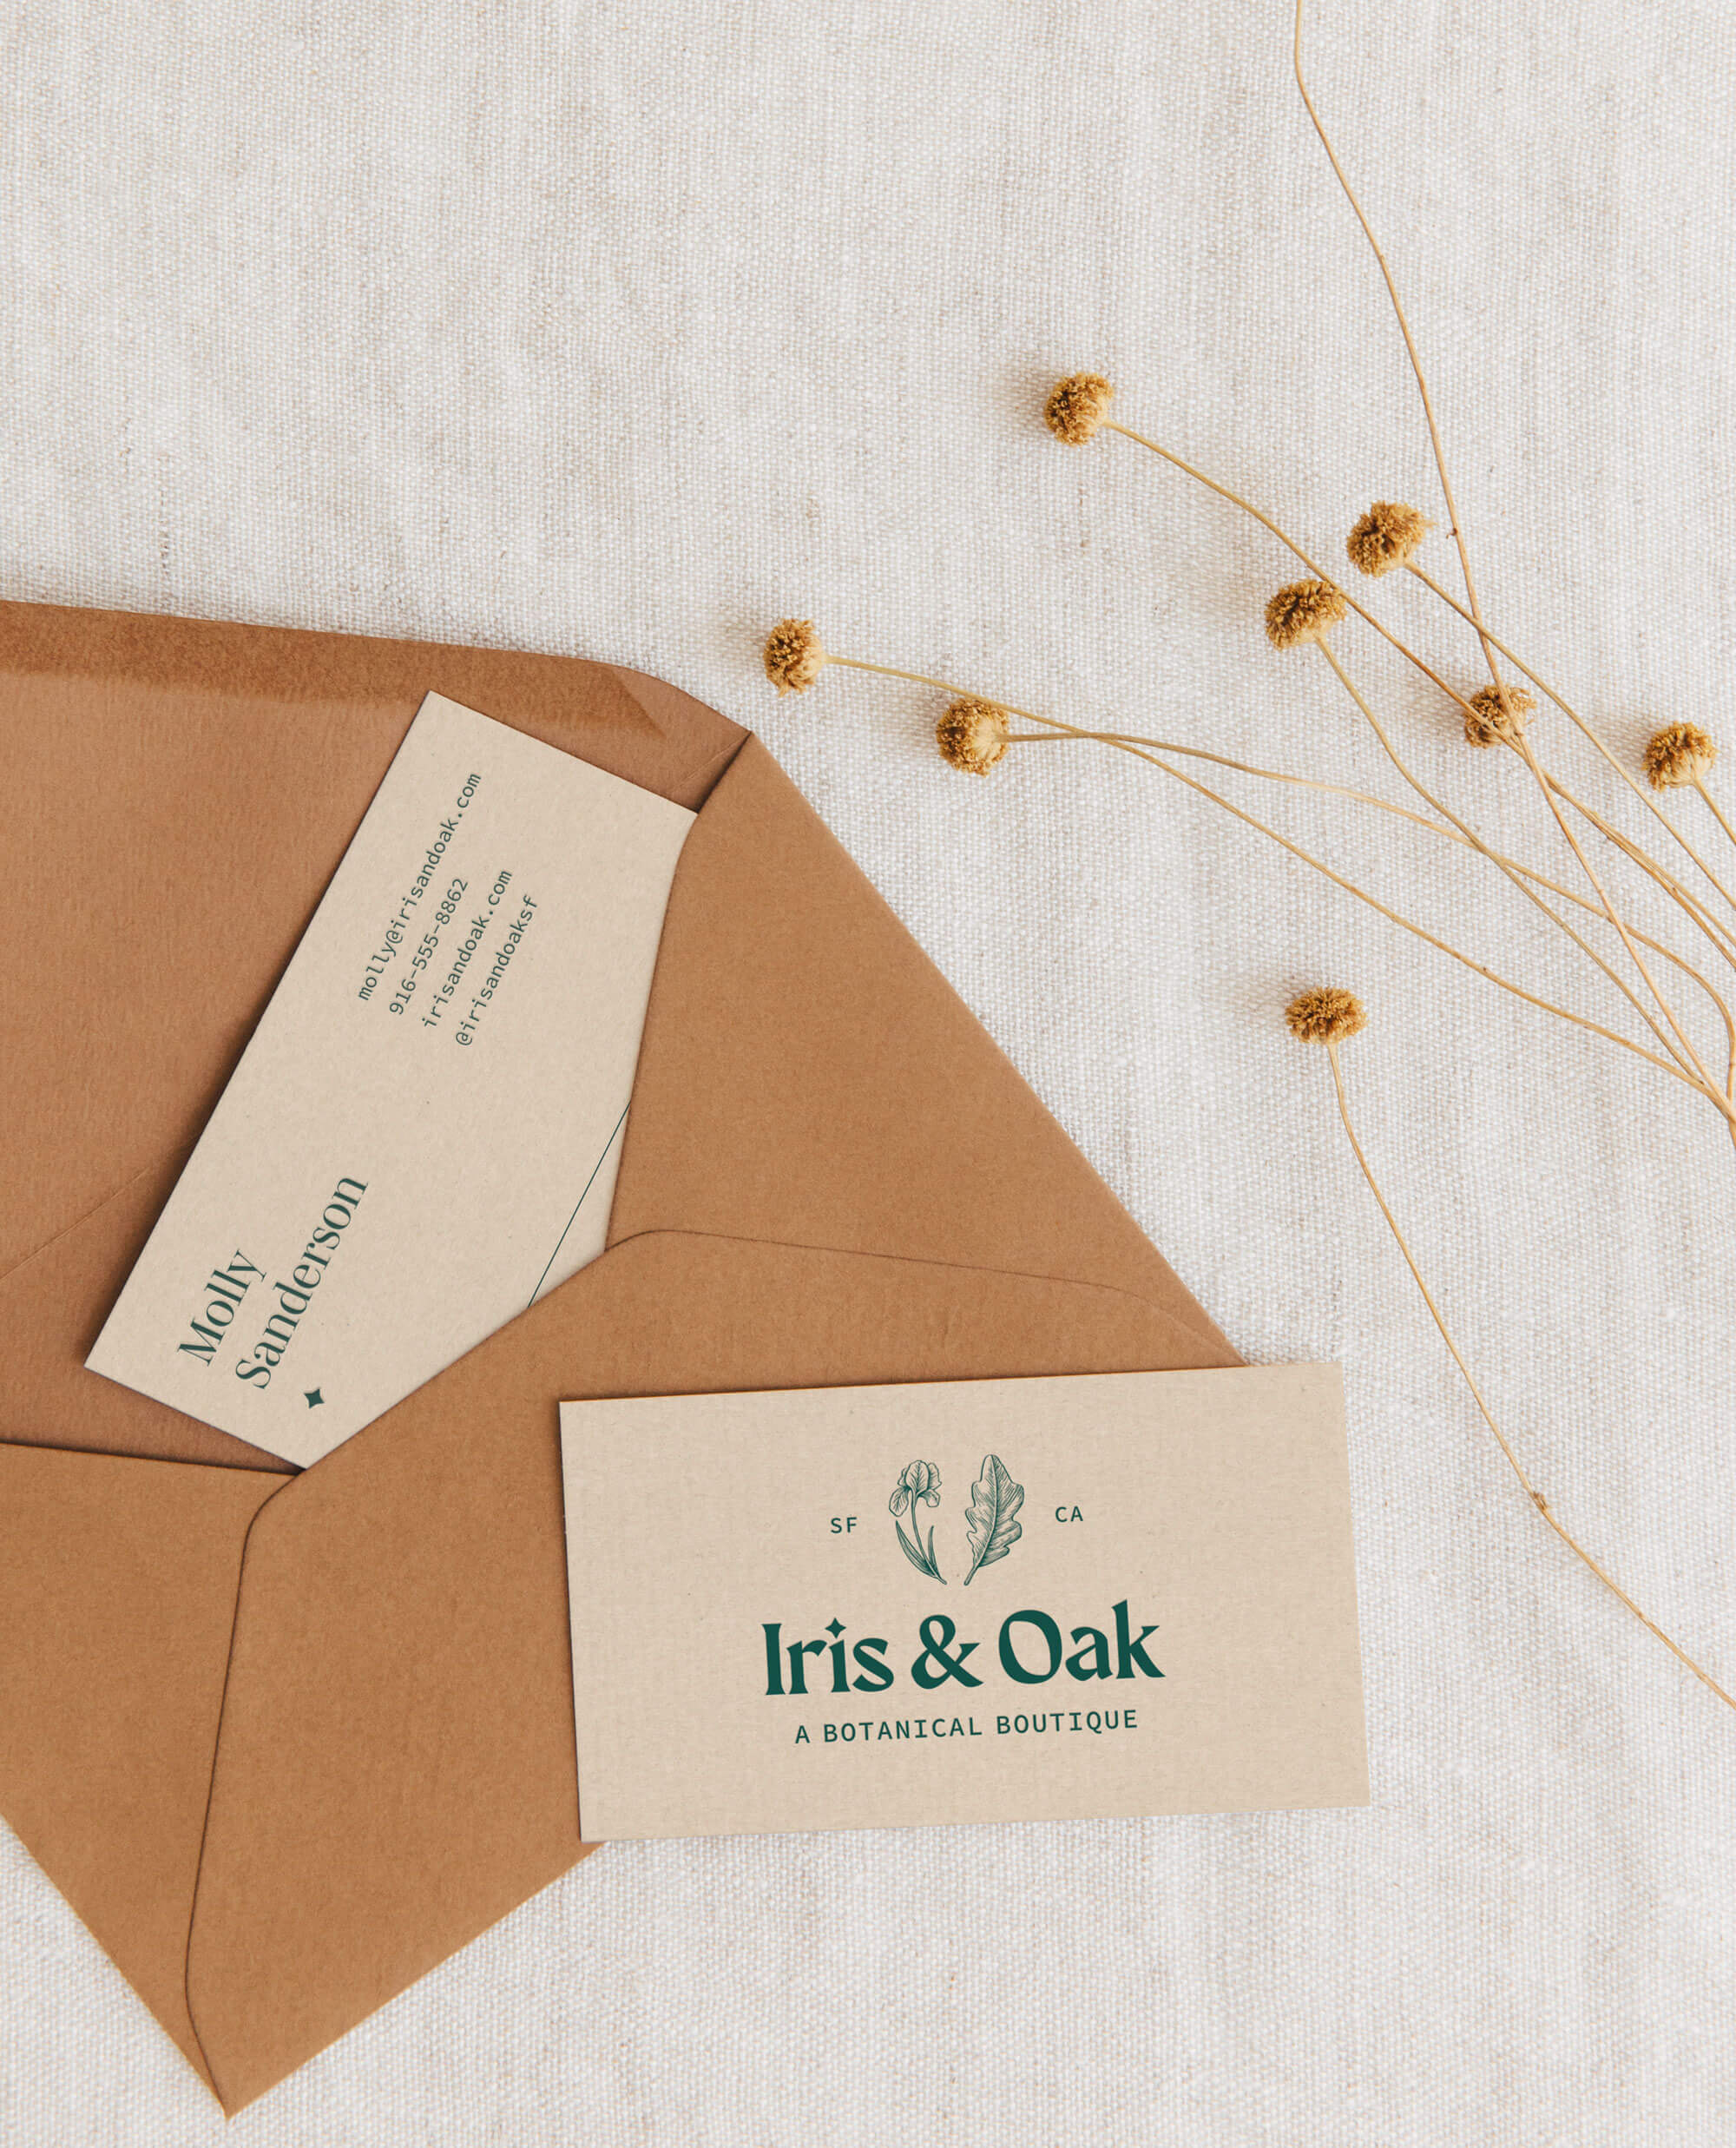 Iris & Oak business cards